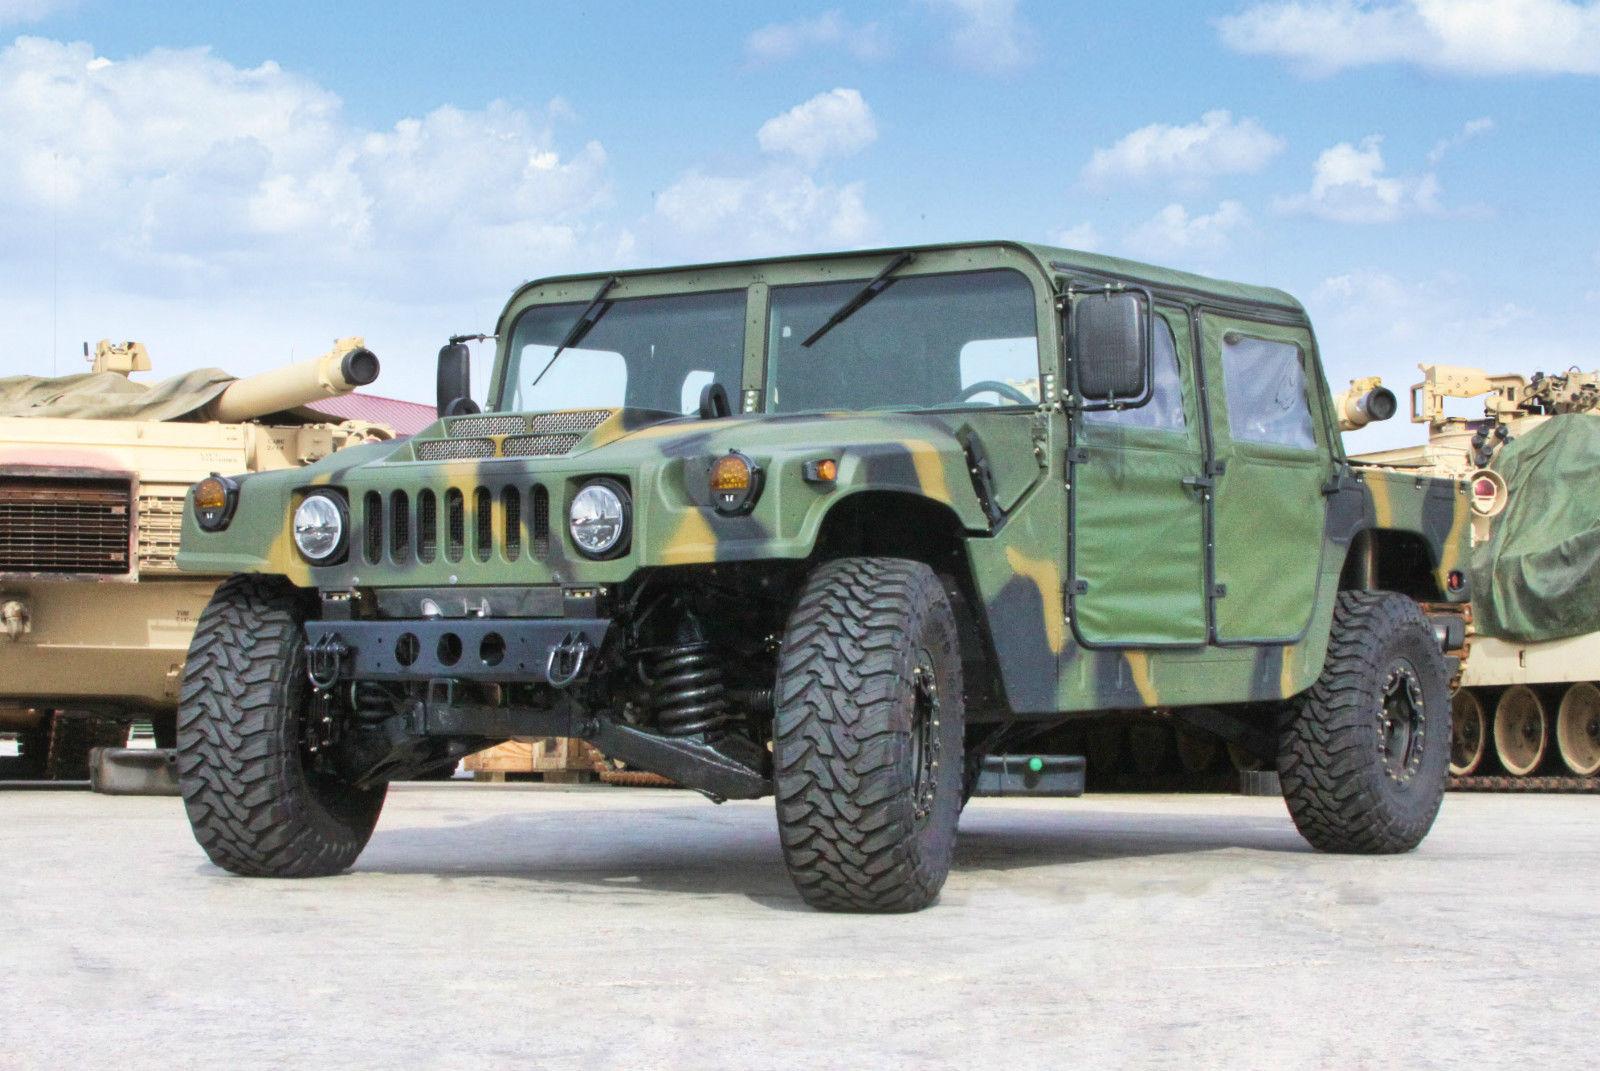 Predator Motorsports M998 Humvee Hmmwv For Sale In Vista